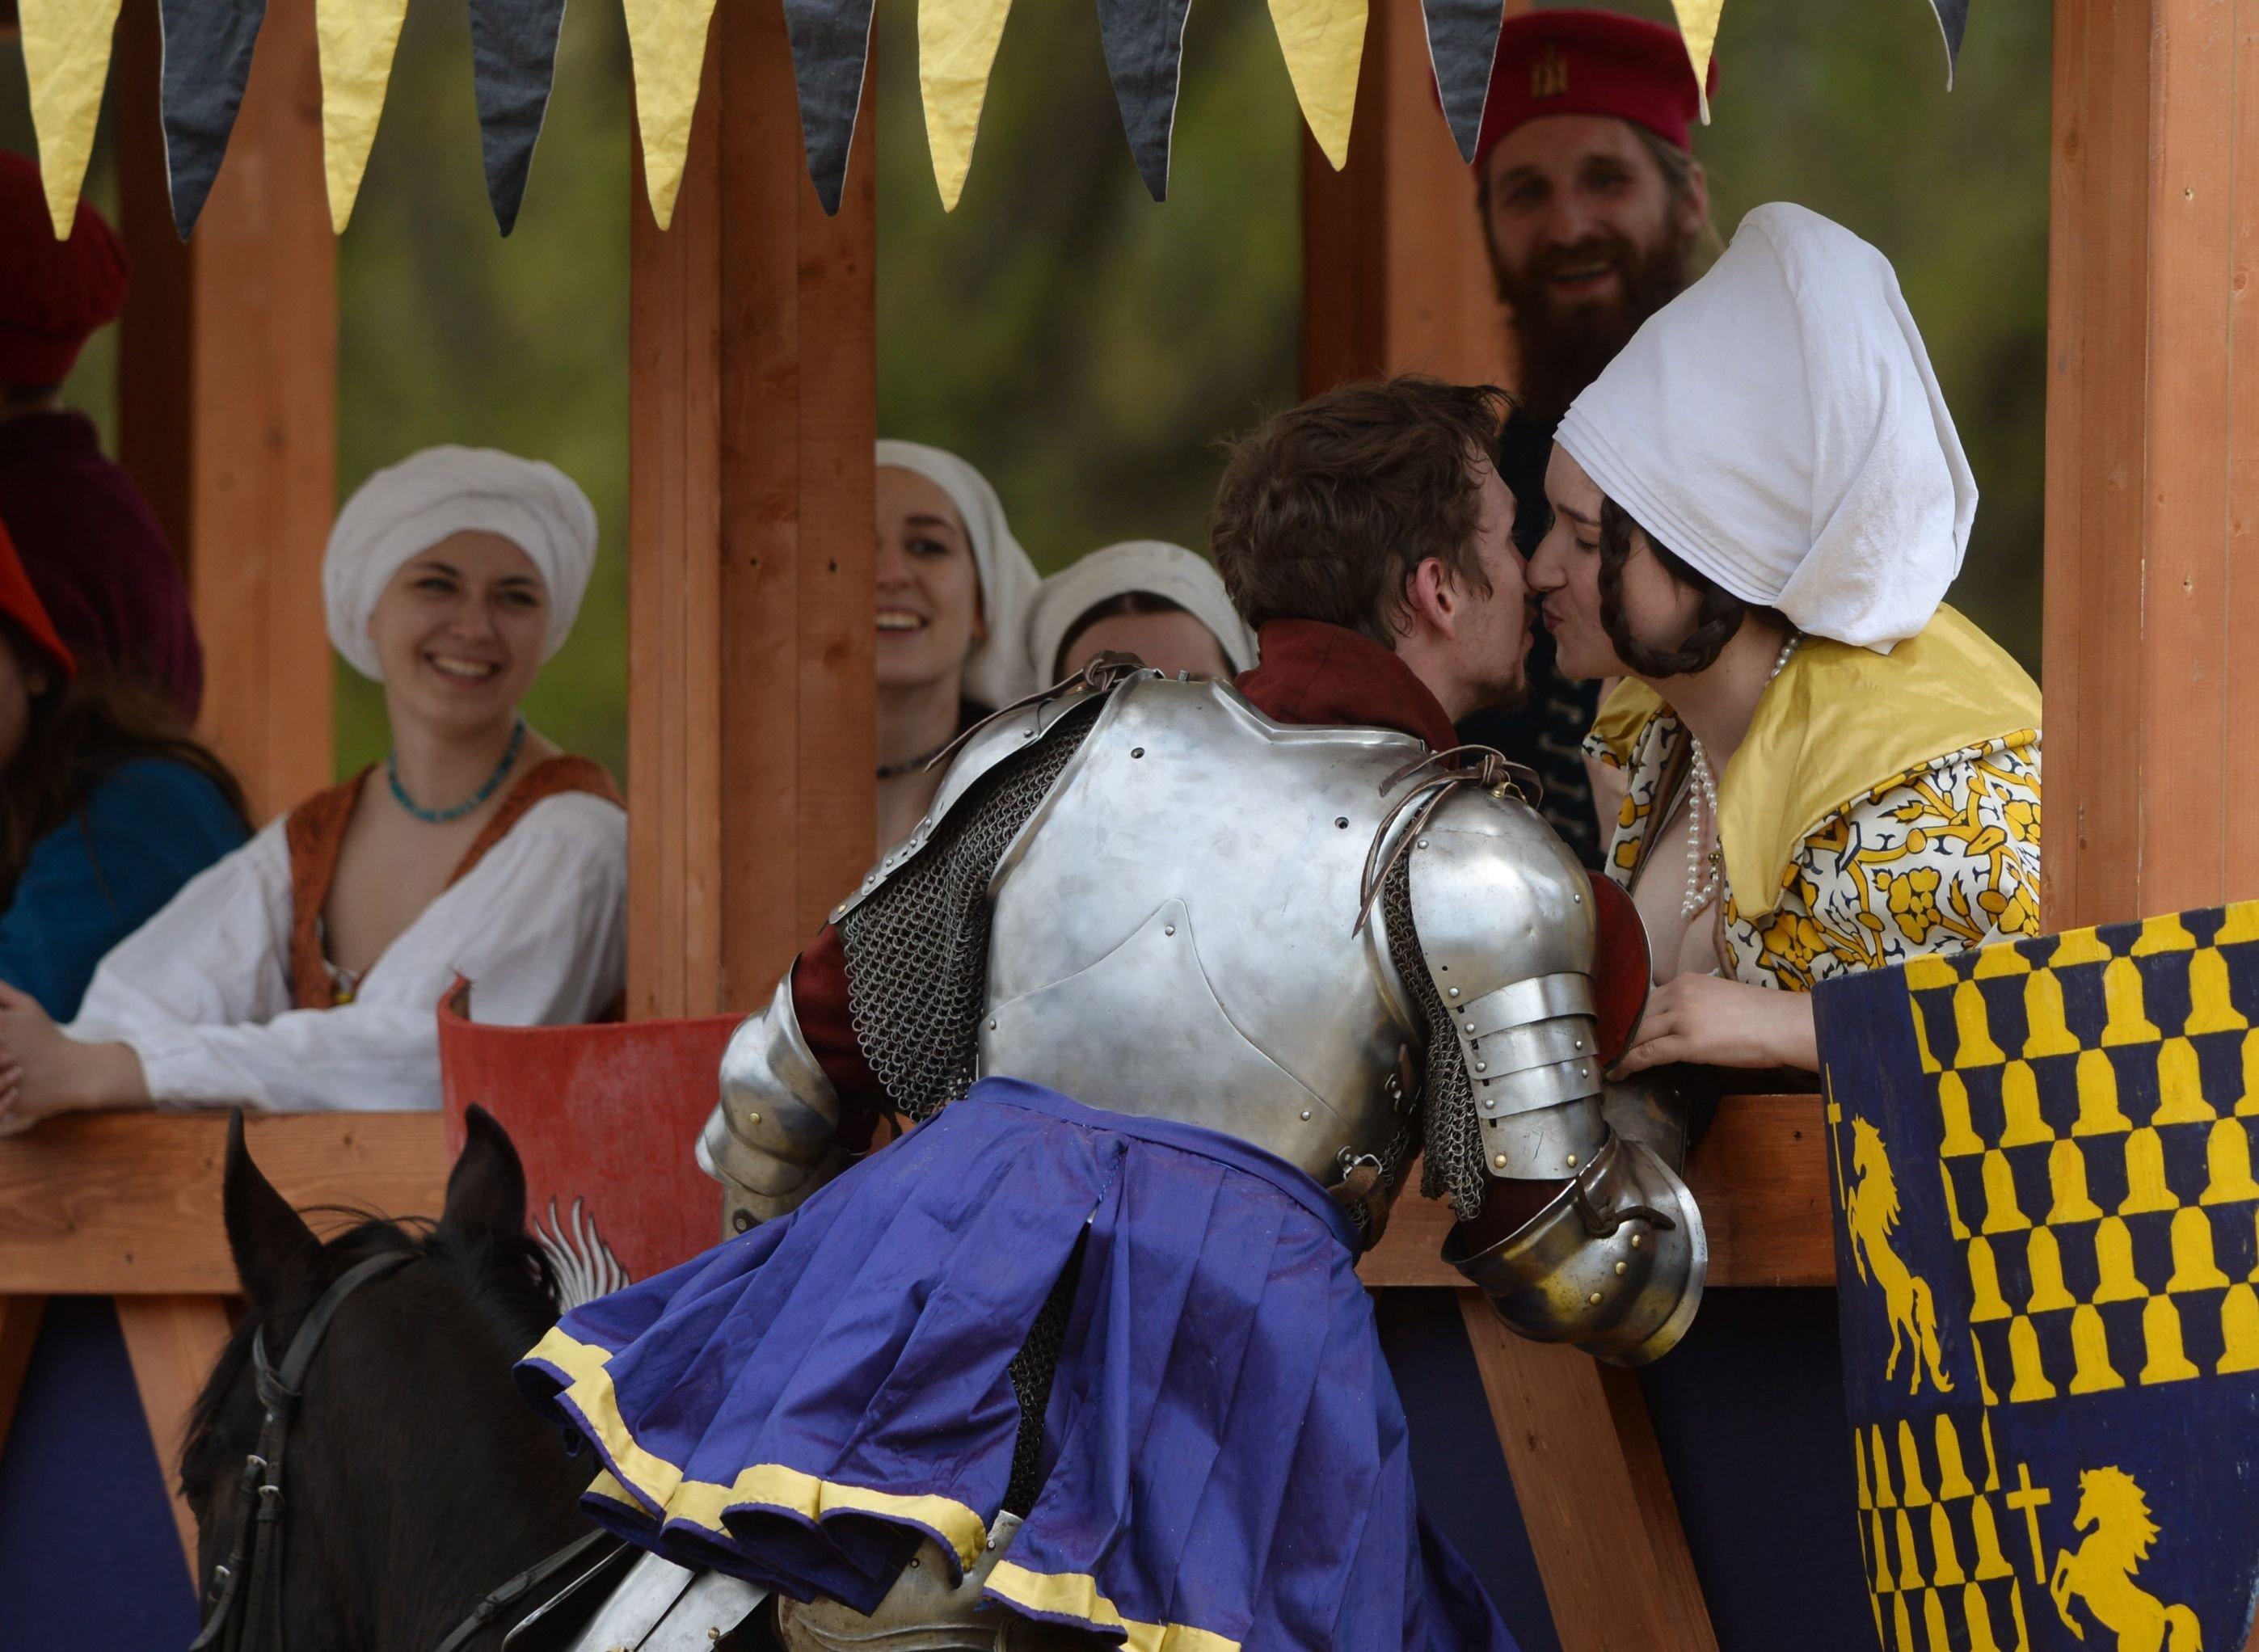 Torneo Medieval San Jorge en Moscú